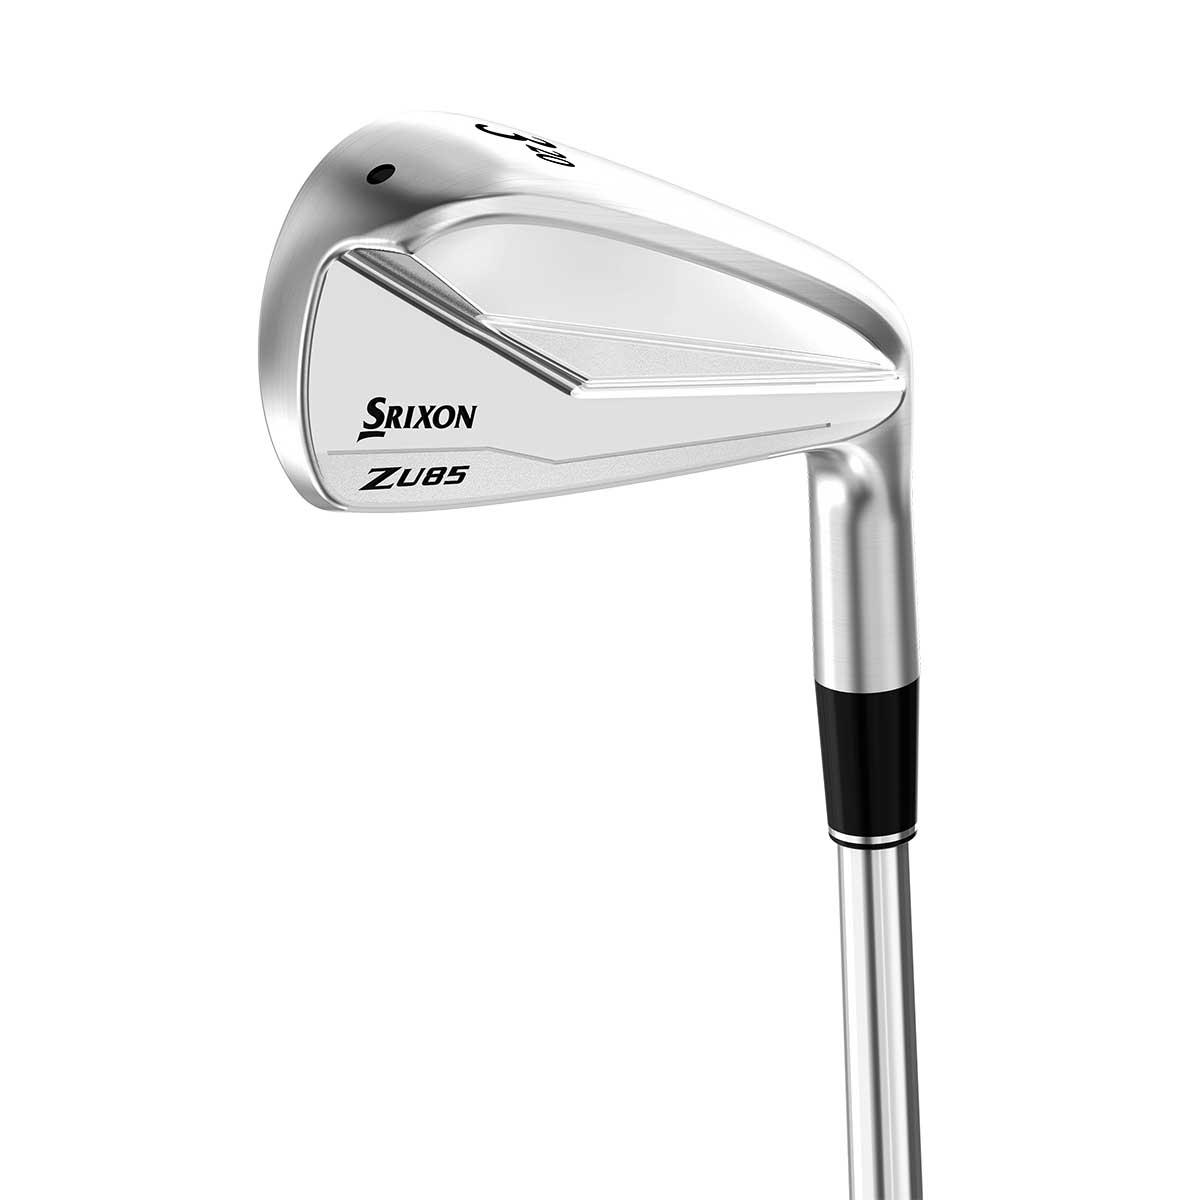 Srixon Z U85 Utility Iron